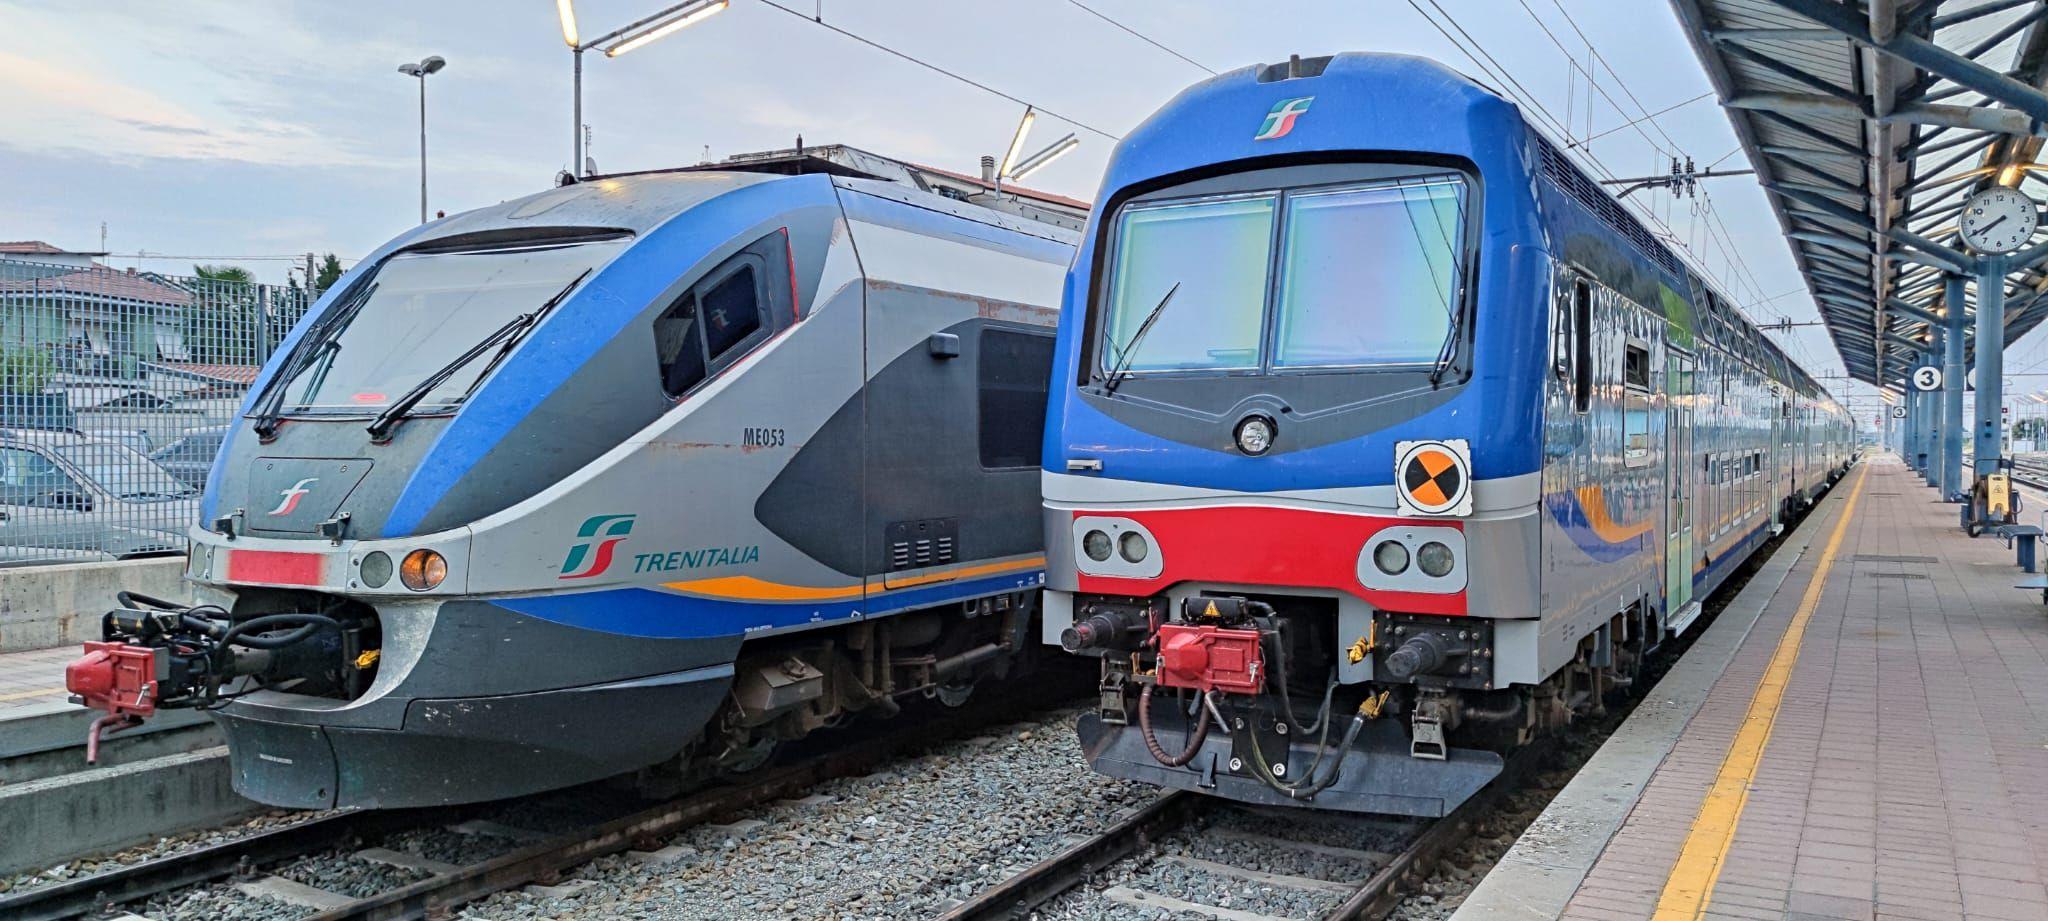 FERROVIA CANAVESANA - Treni doppi per i pendolari, Fava: «Promessa mantenuta»